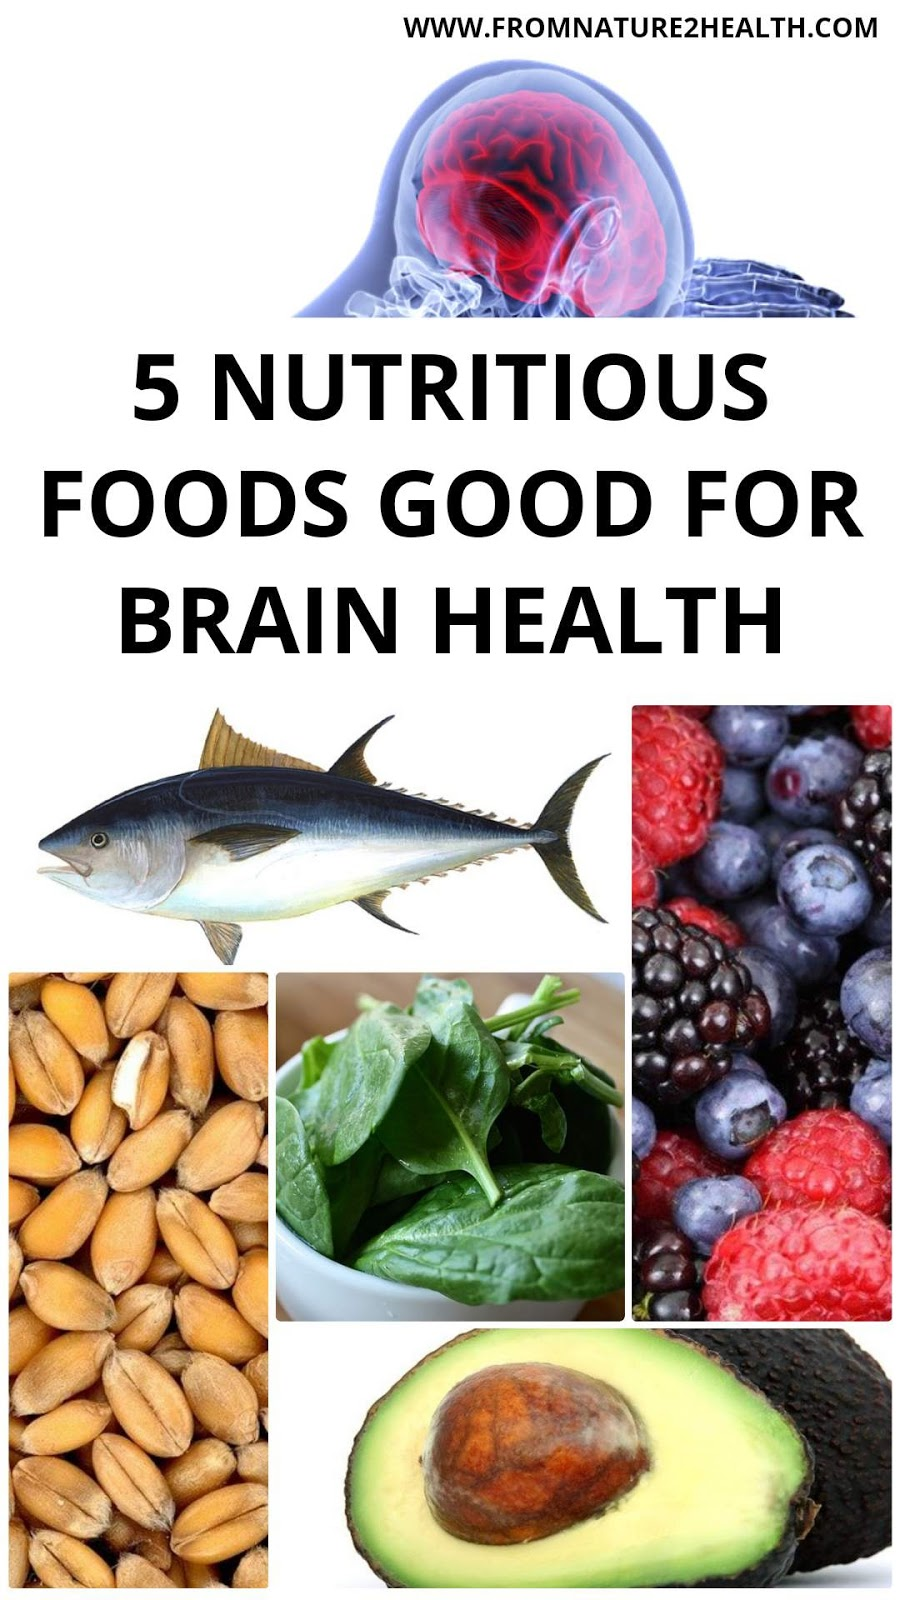 5 Nutritious Foods Good for Brain Health